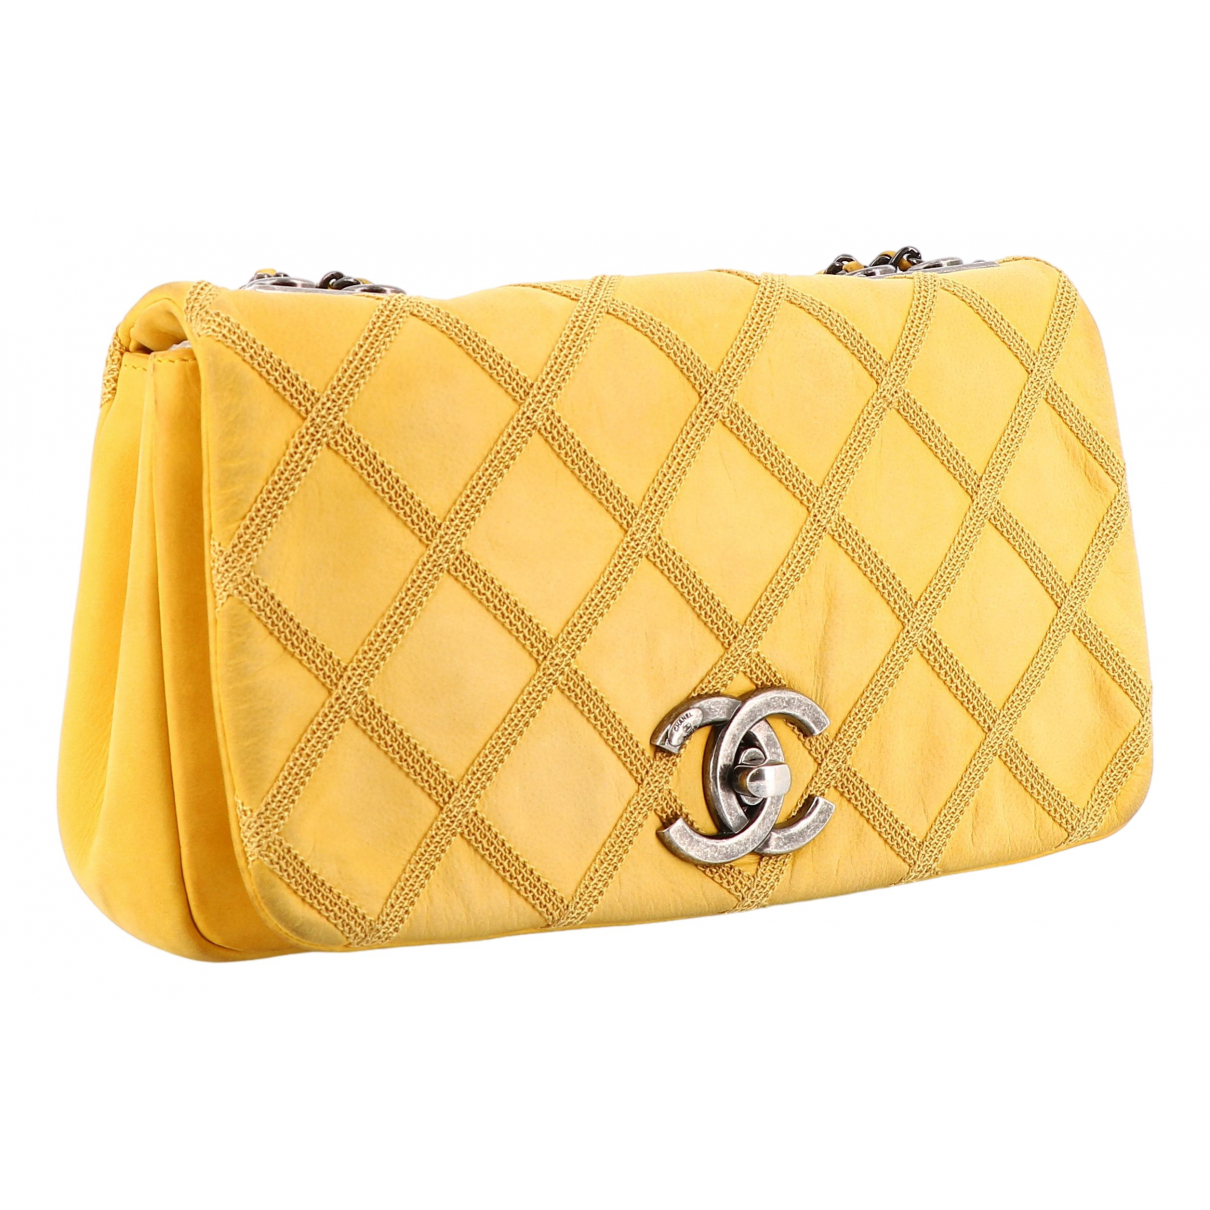 Chanel \N Handtasche in  Gelb Leder